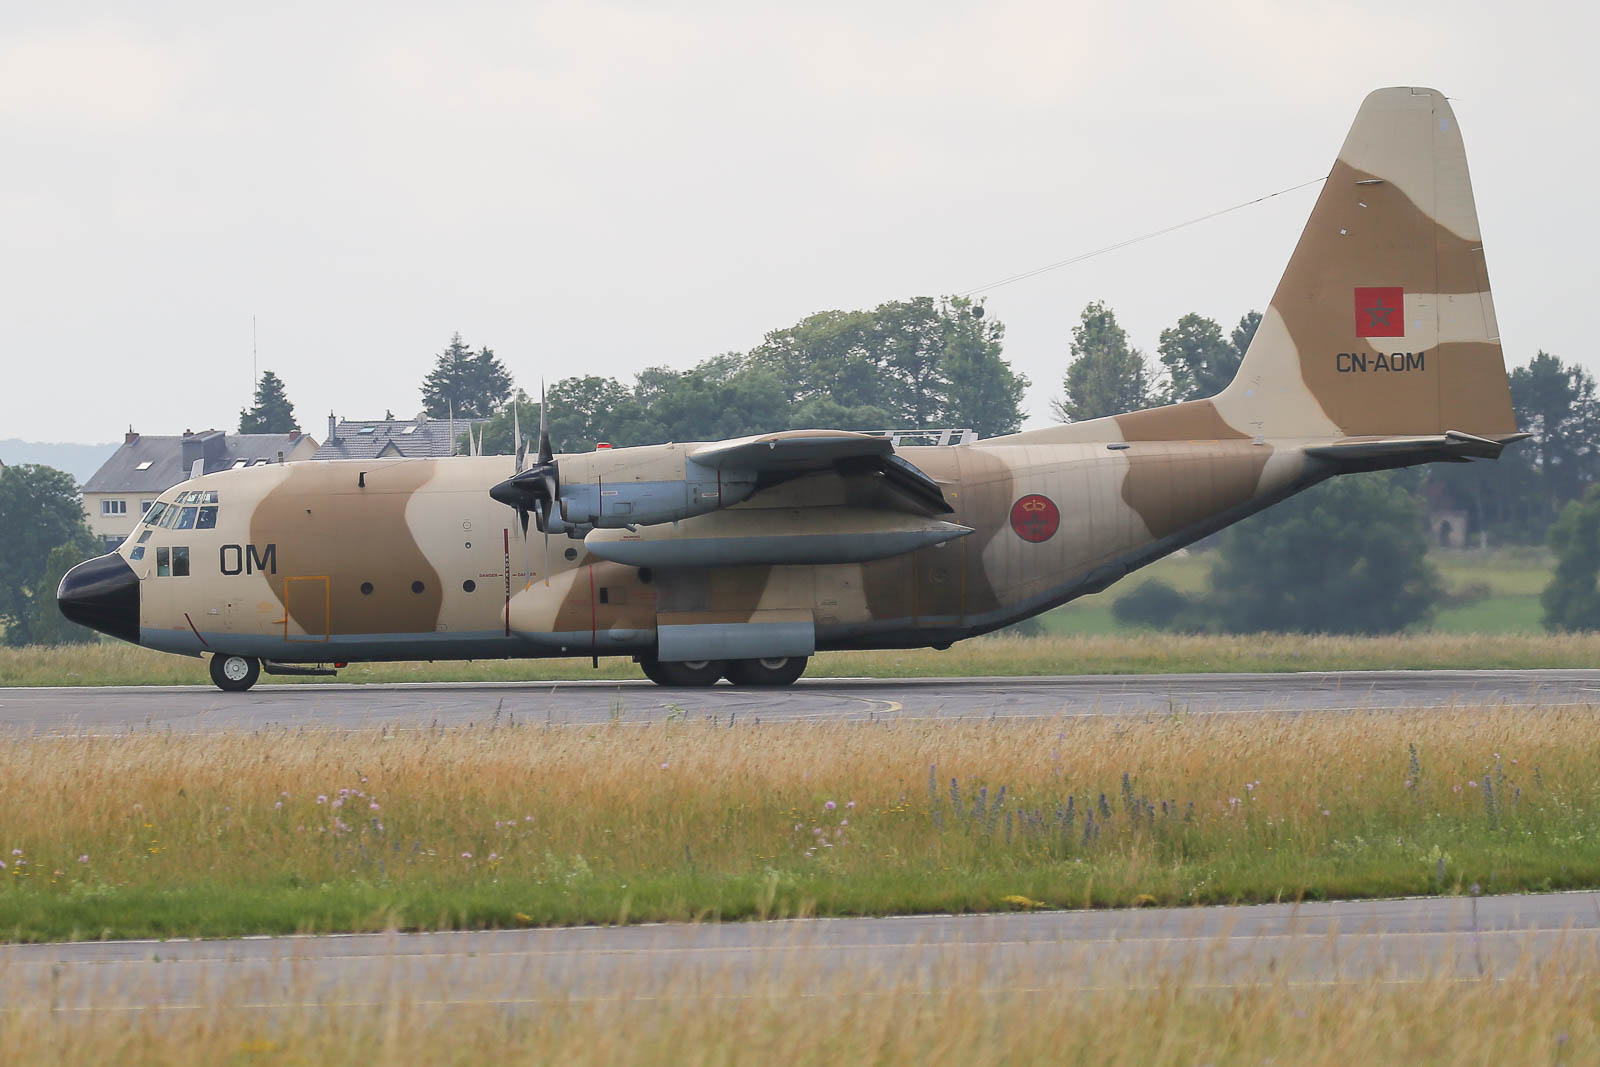 FRA: Photos d'avions de transport - Page 43 51270506195_9041511f2f_o_d